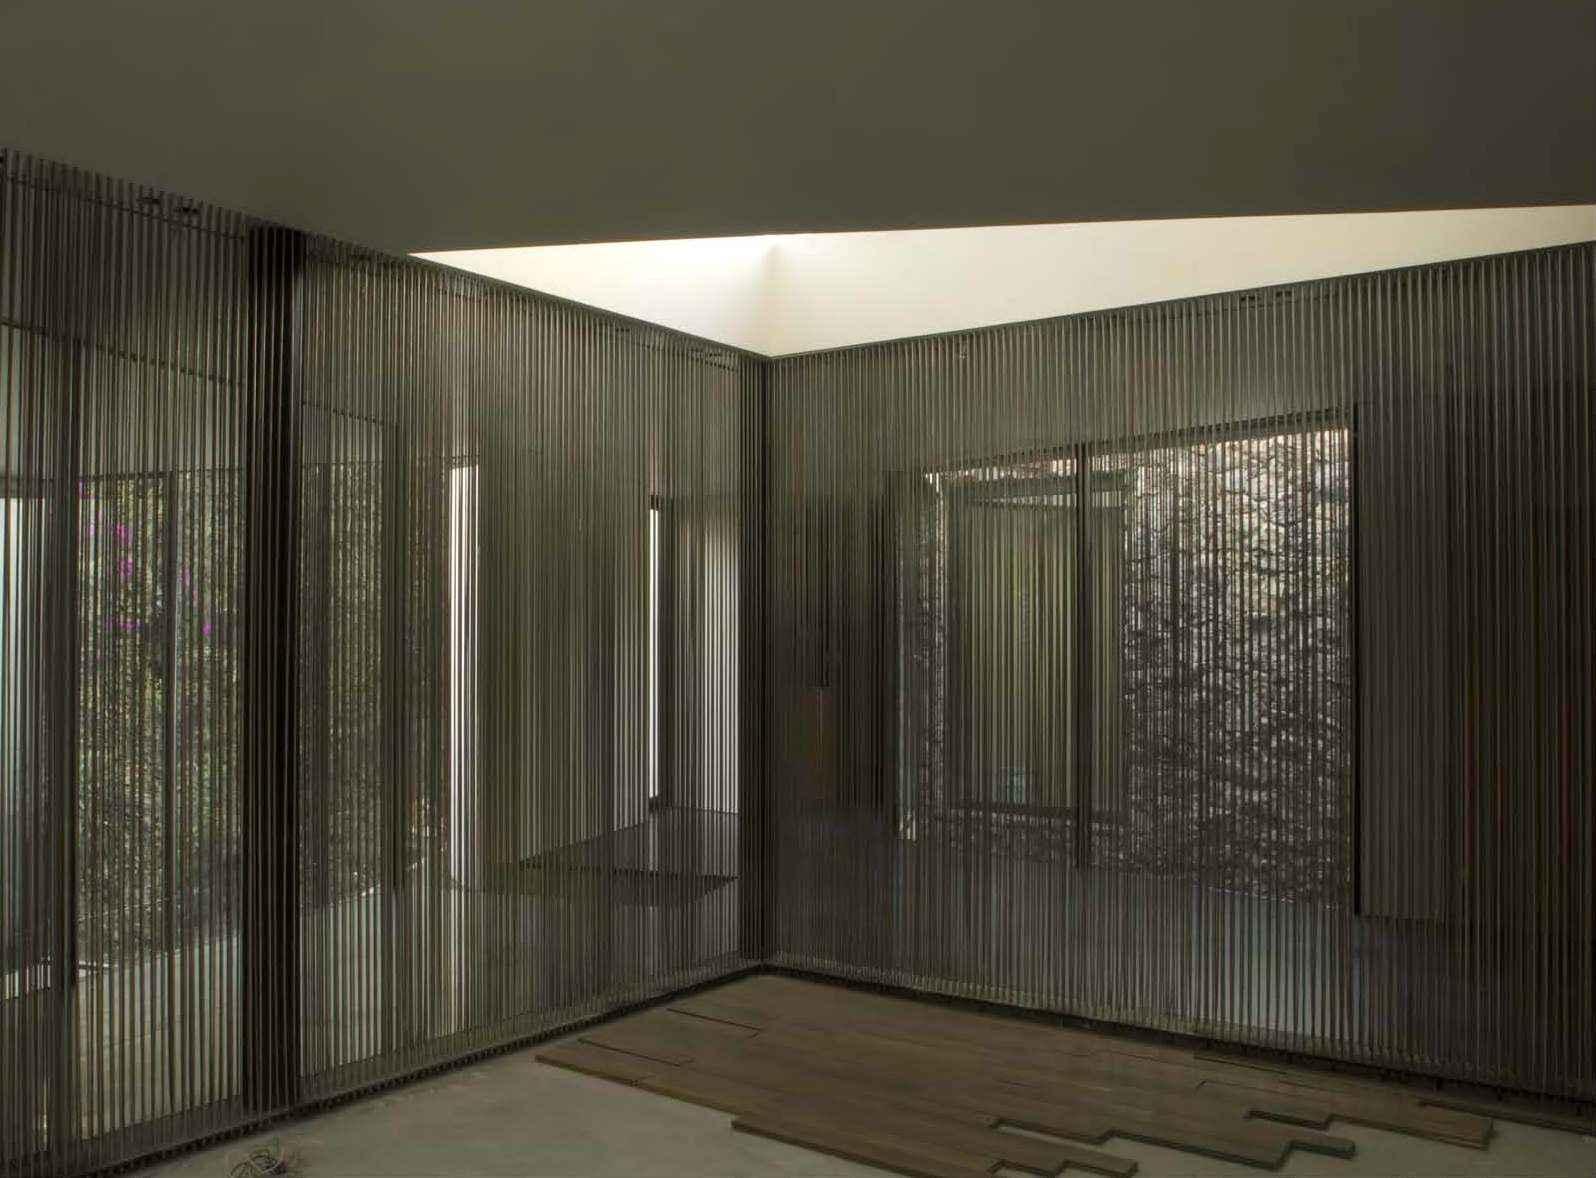 Pamplona será sede de la Bienal de Arquitectura Latinoamericana